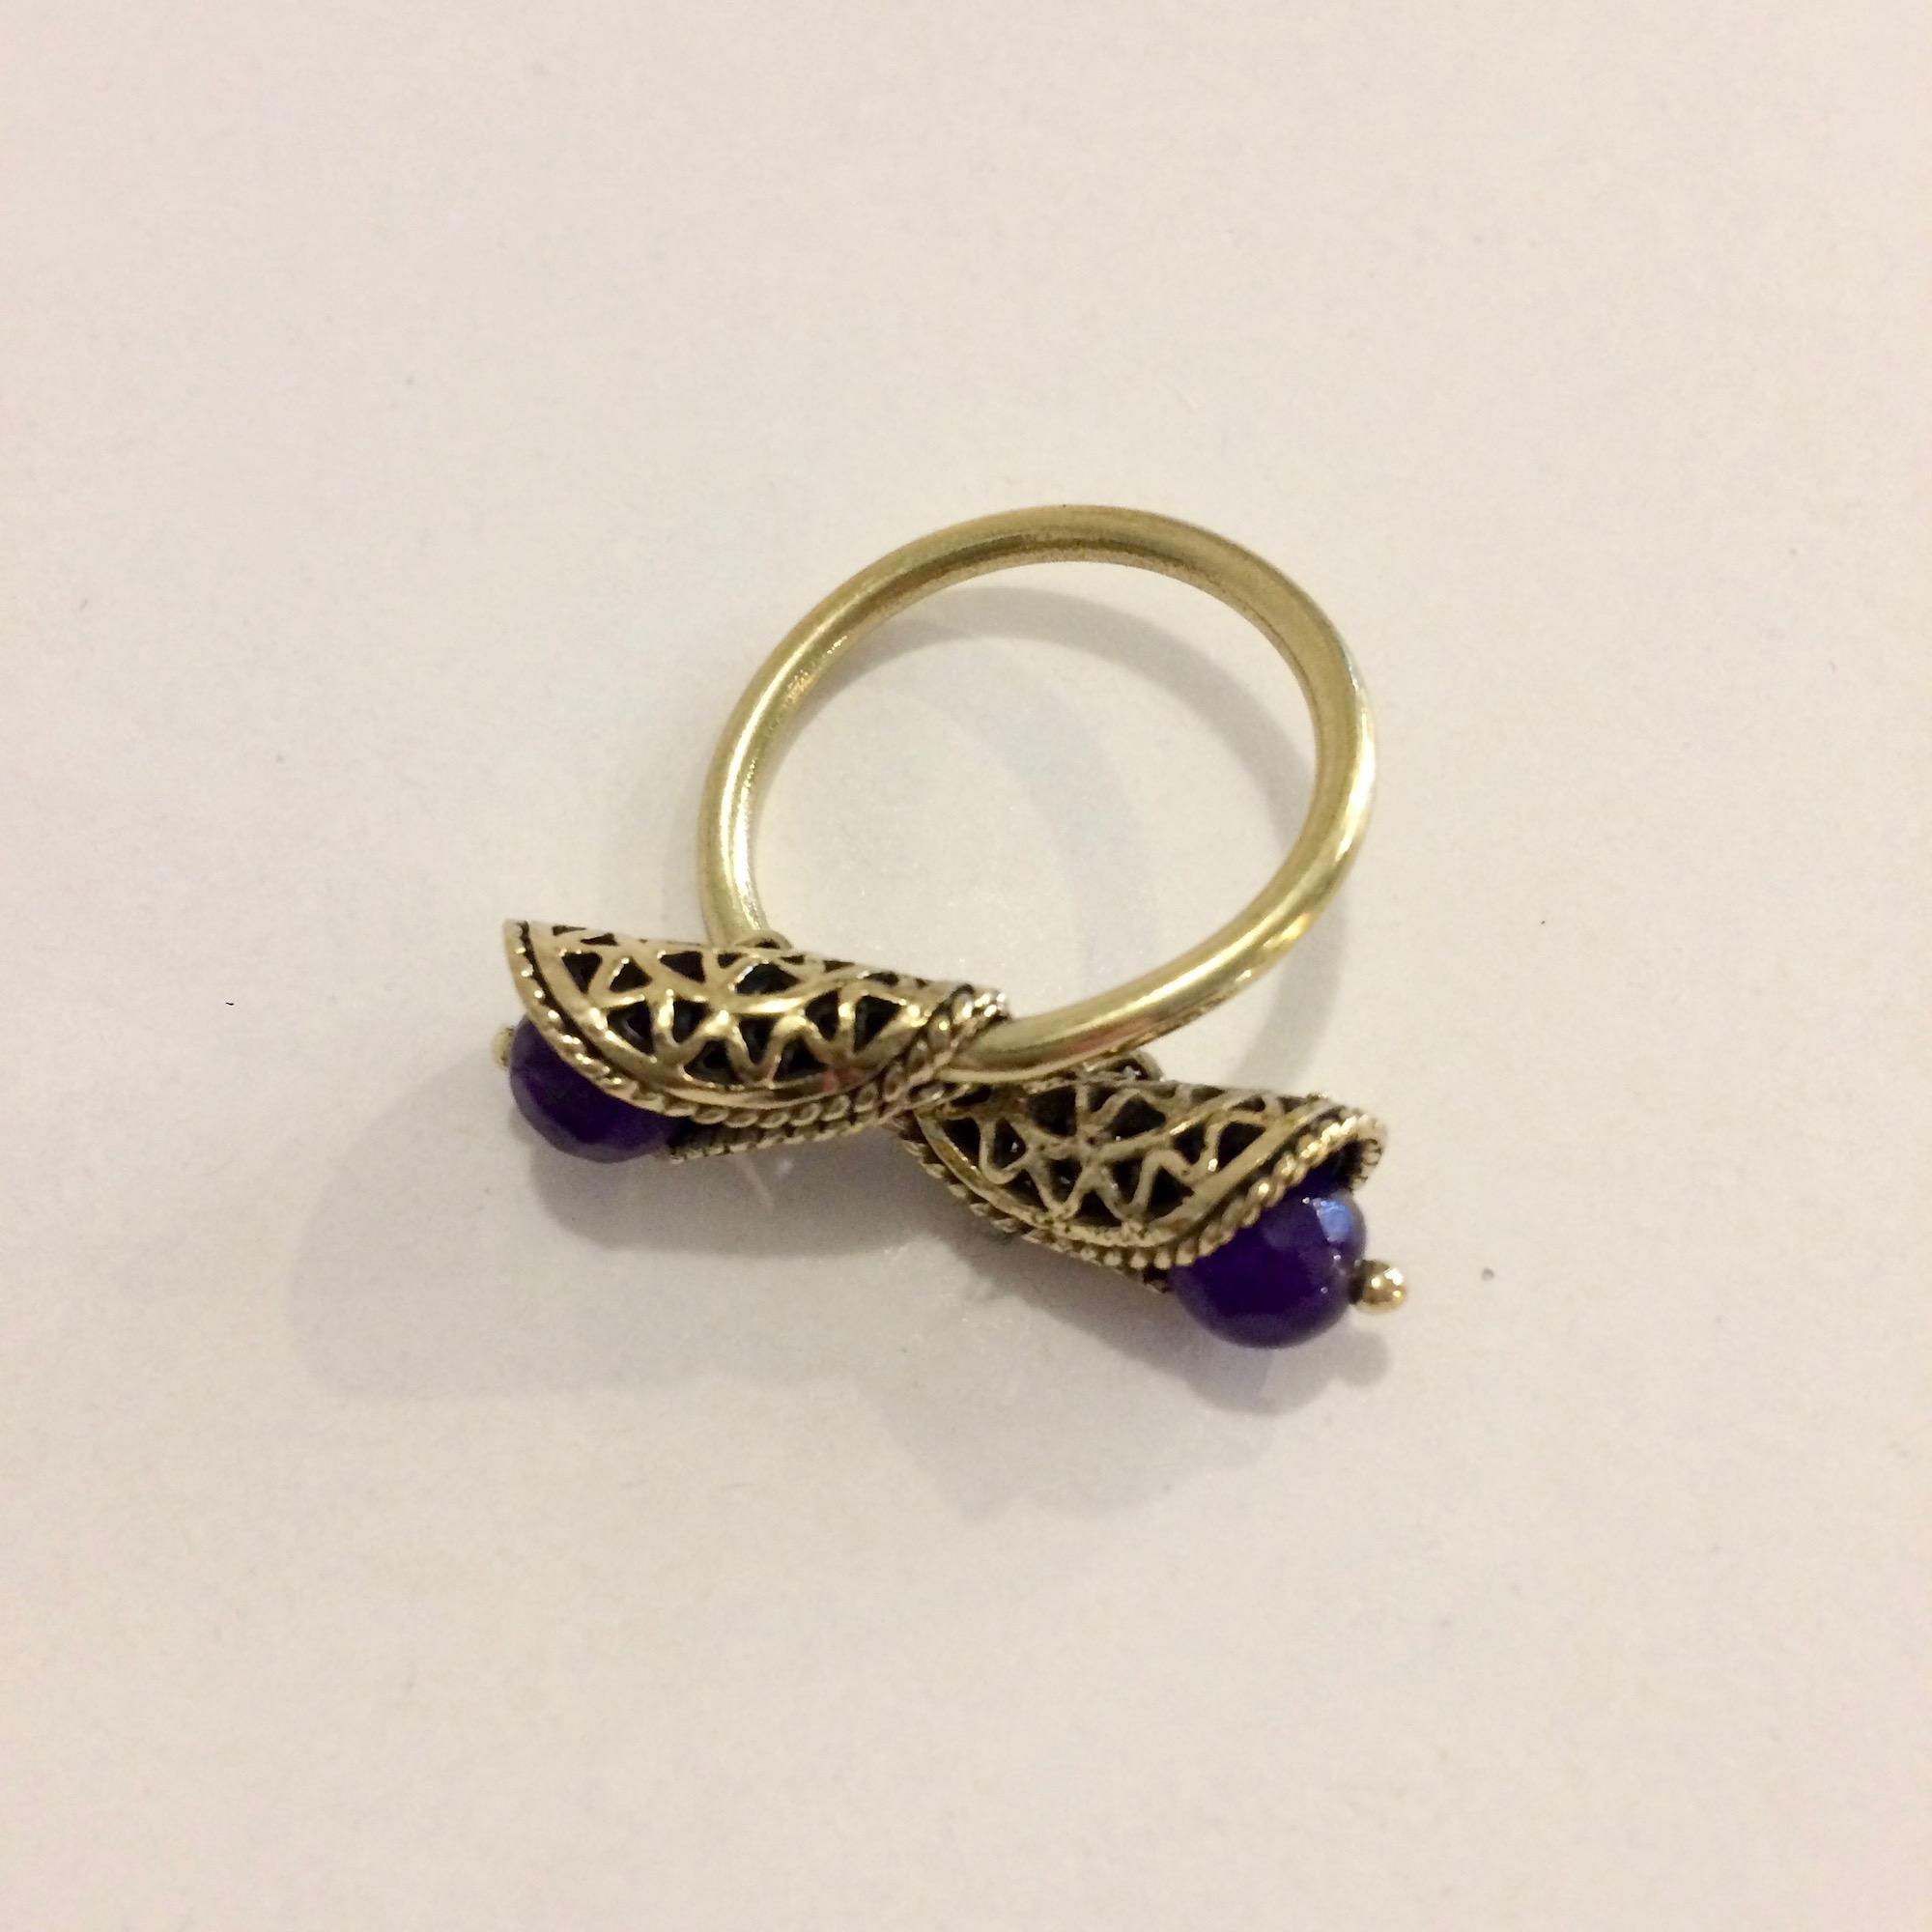 Egyptian Brass Curled Mandala & Bead Ring